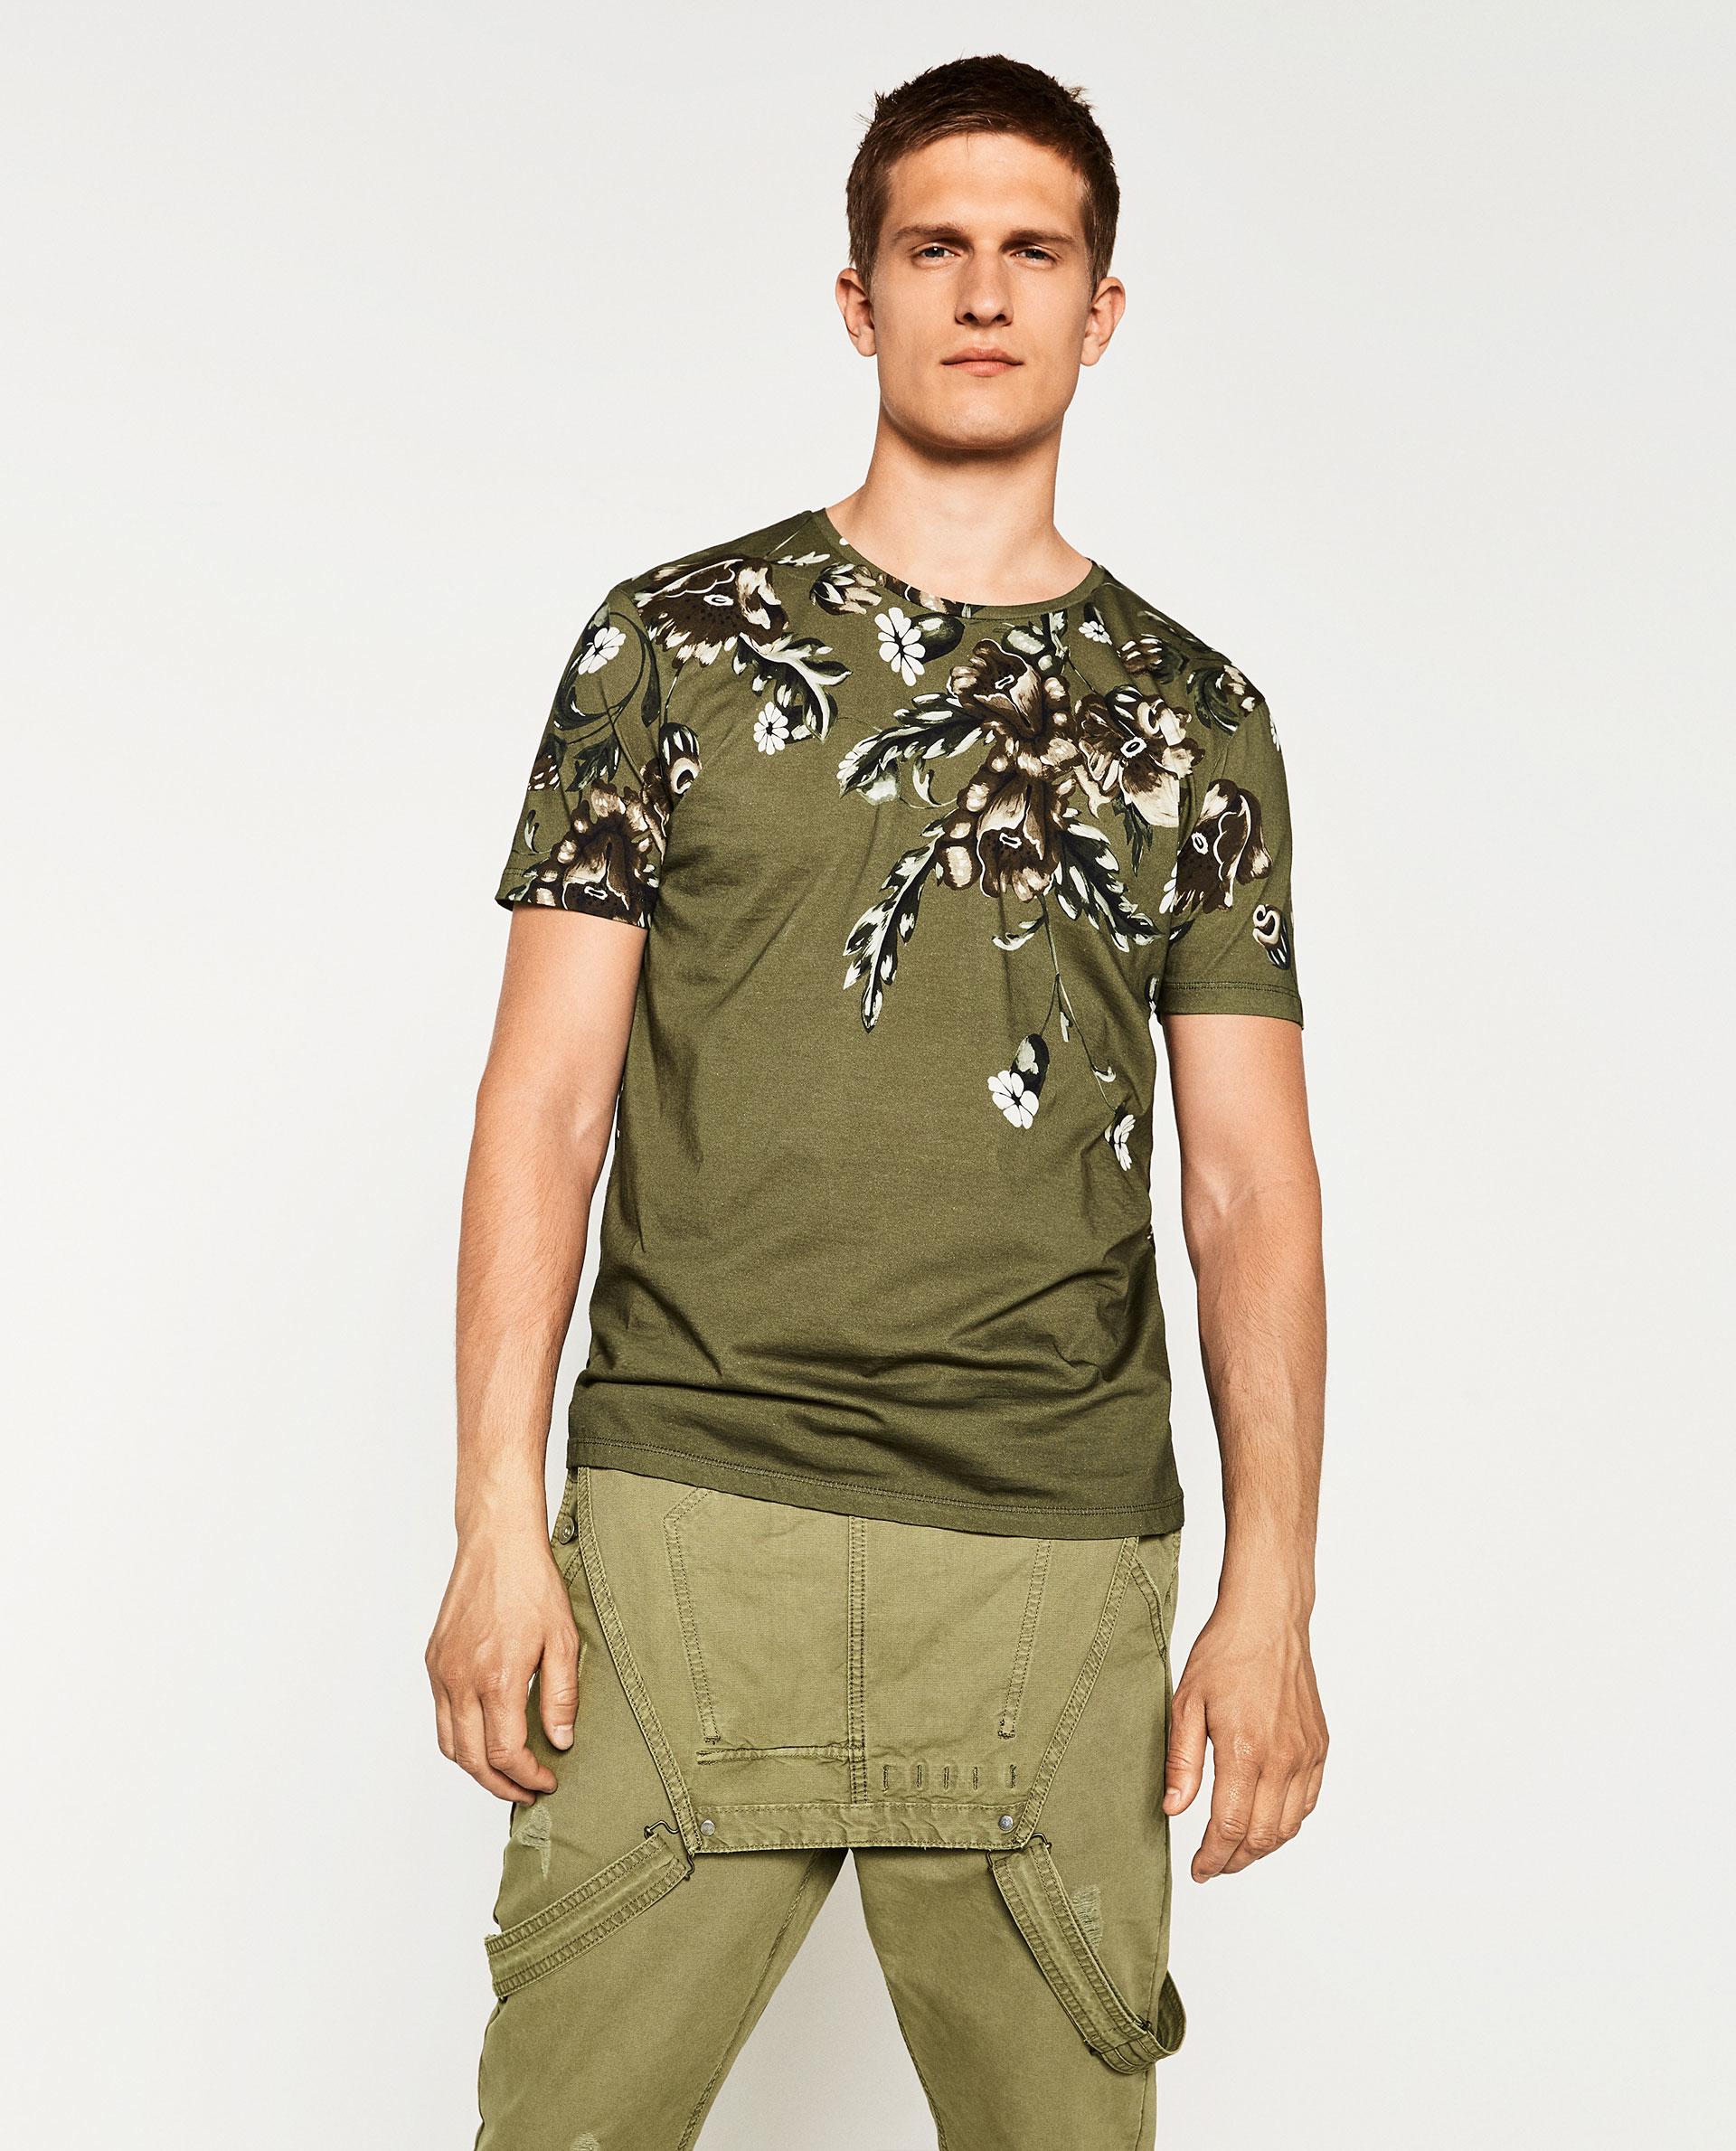 Zara retro floral t shirt in natural for men lyst for Zara mens floral shirt